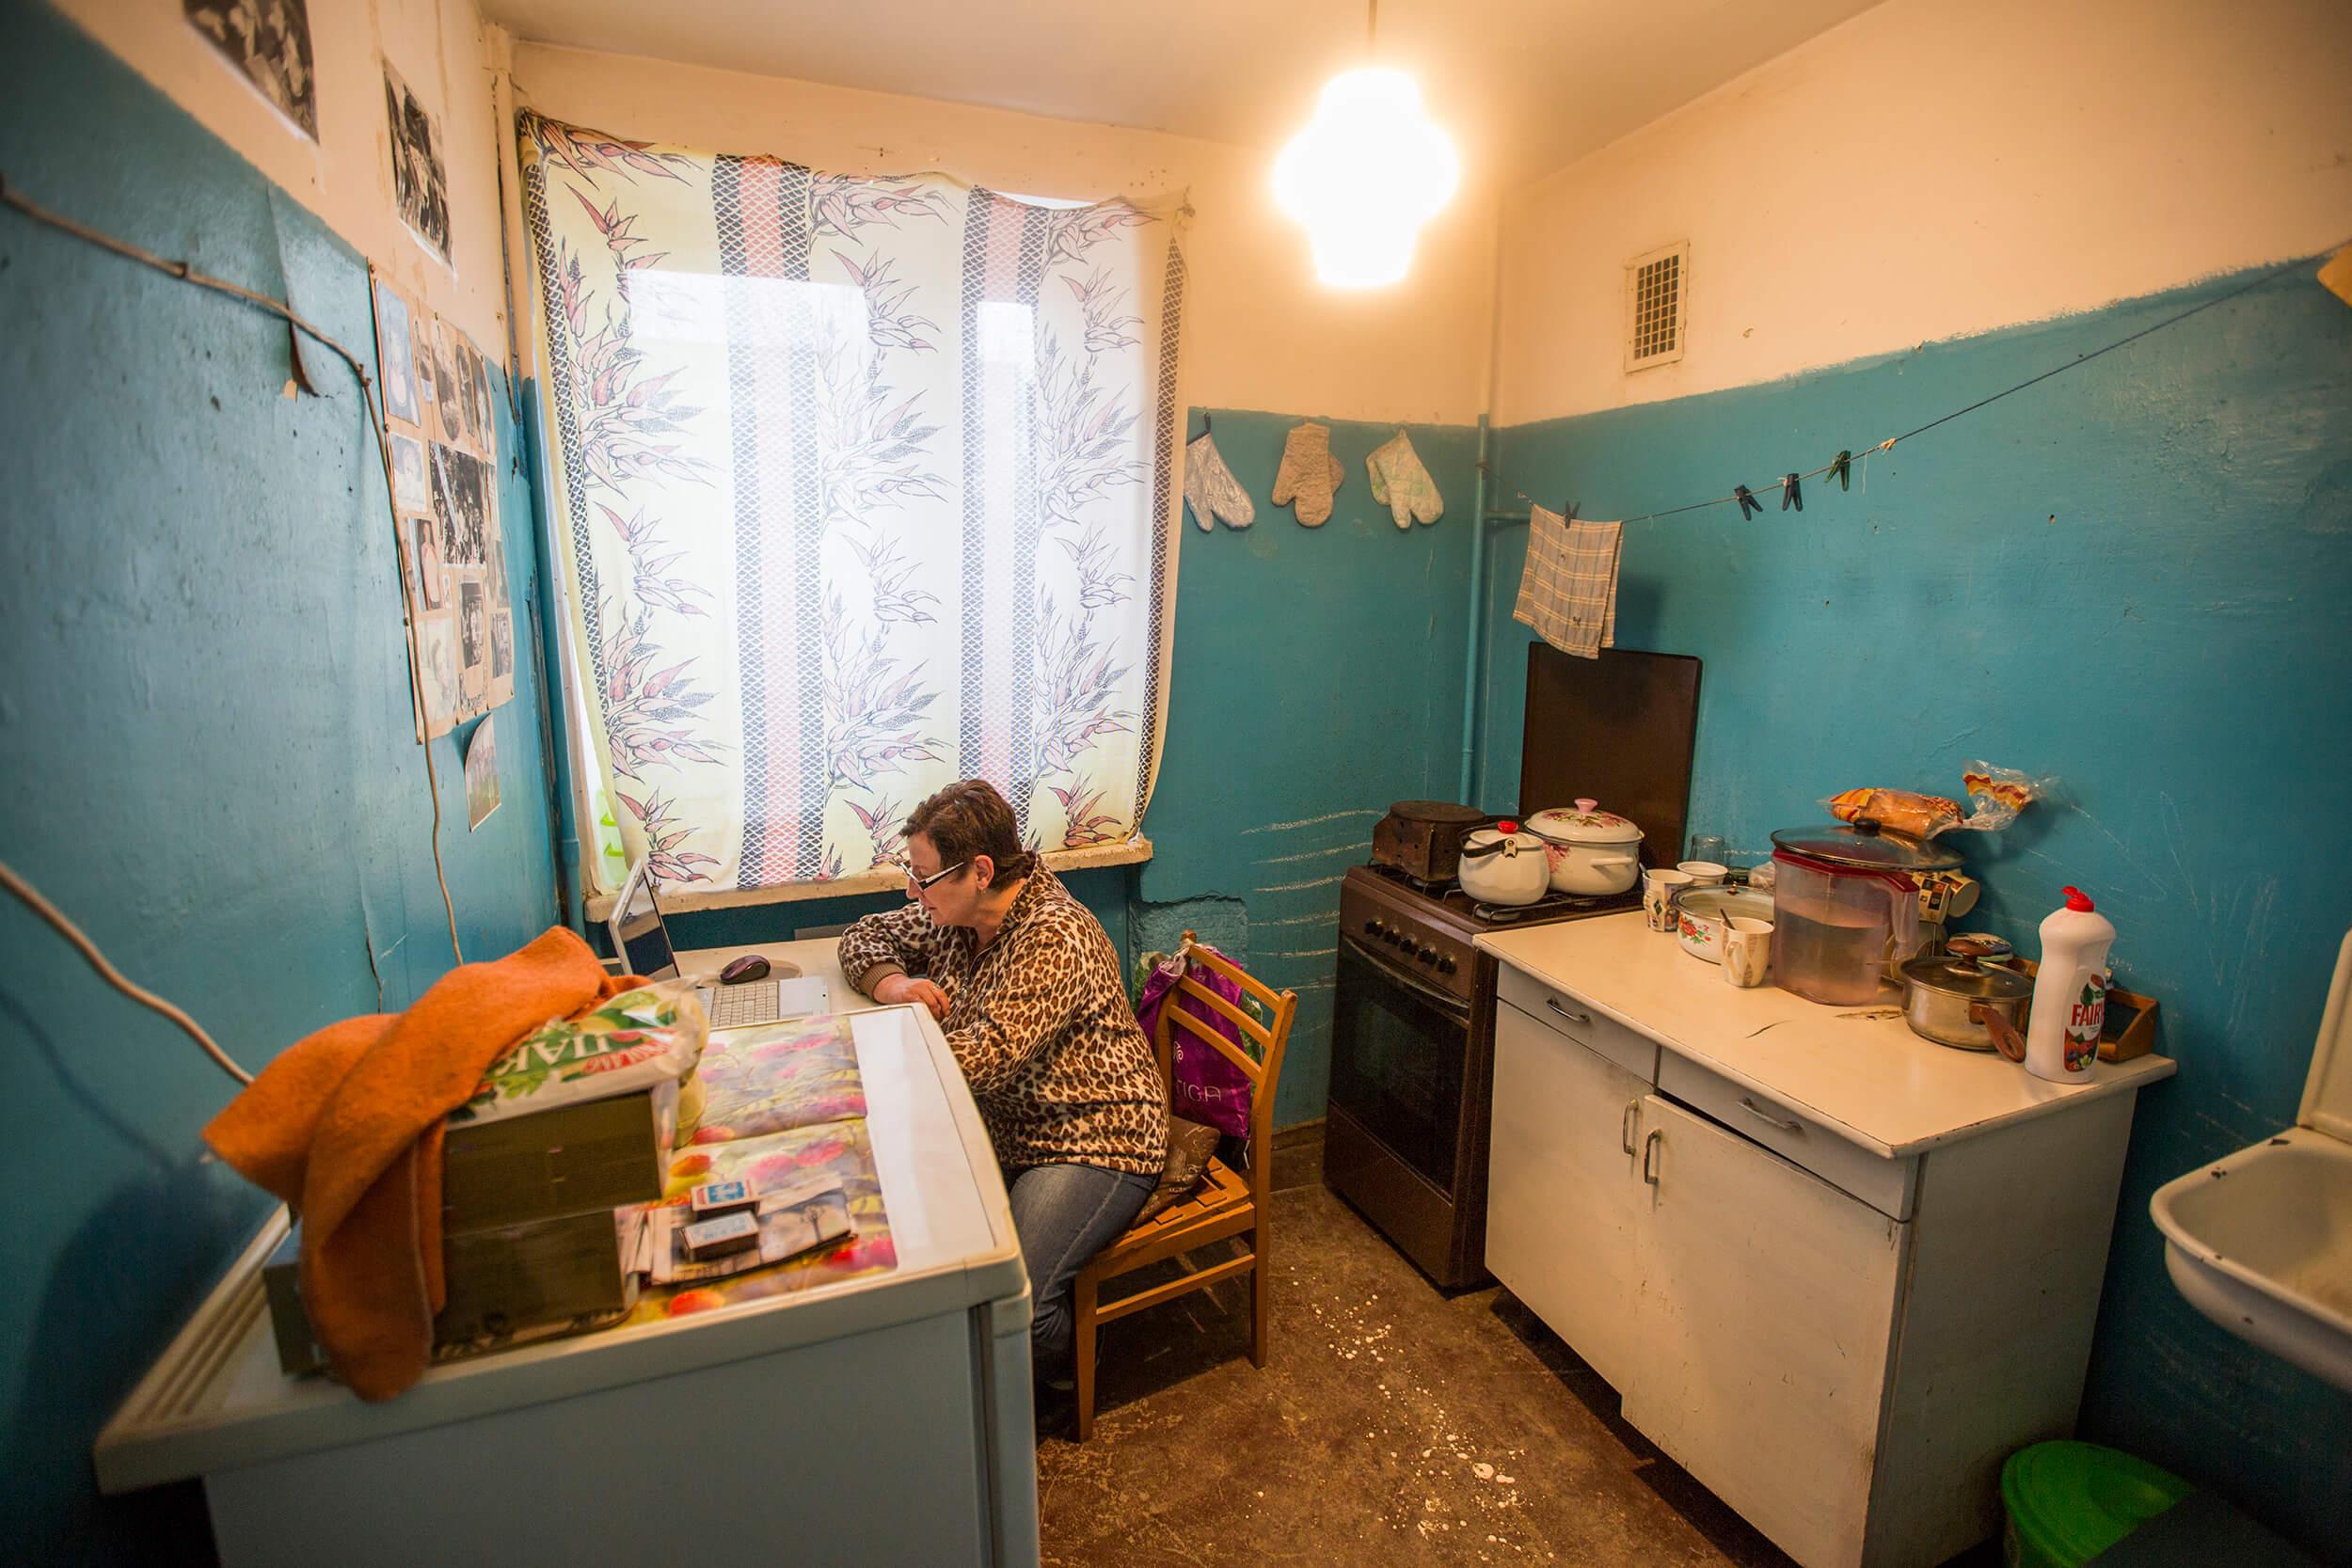 Raisa in her home in Simferopol.